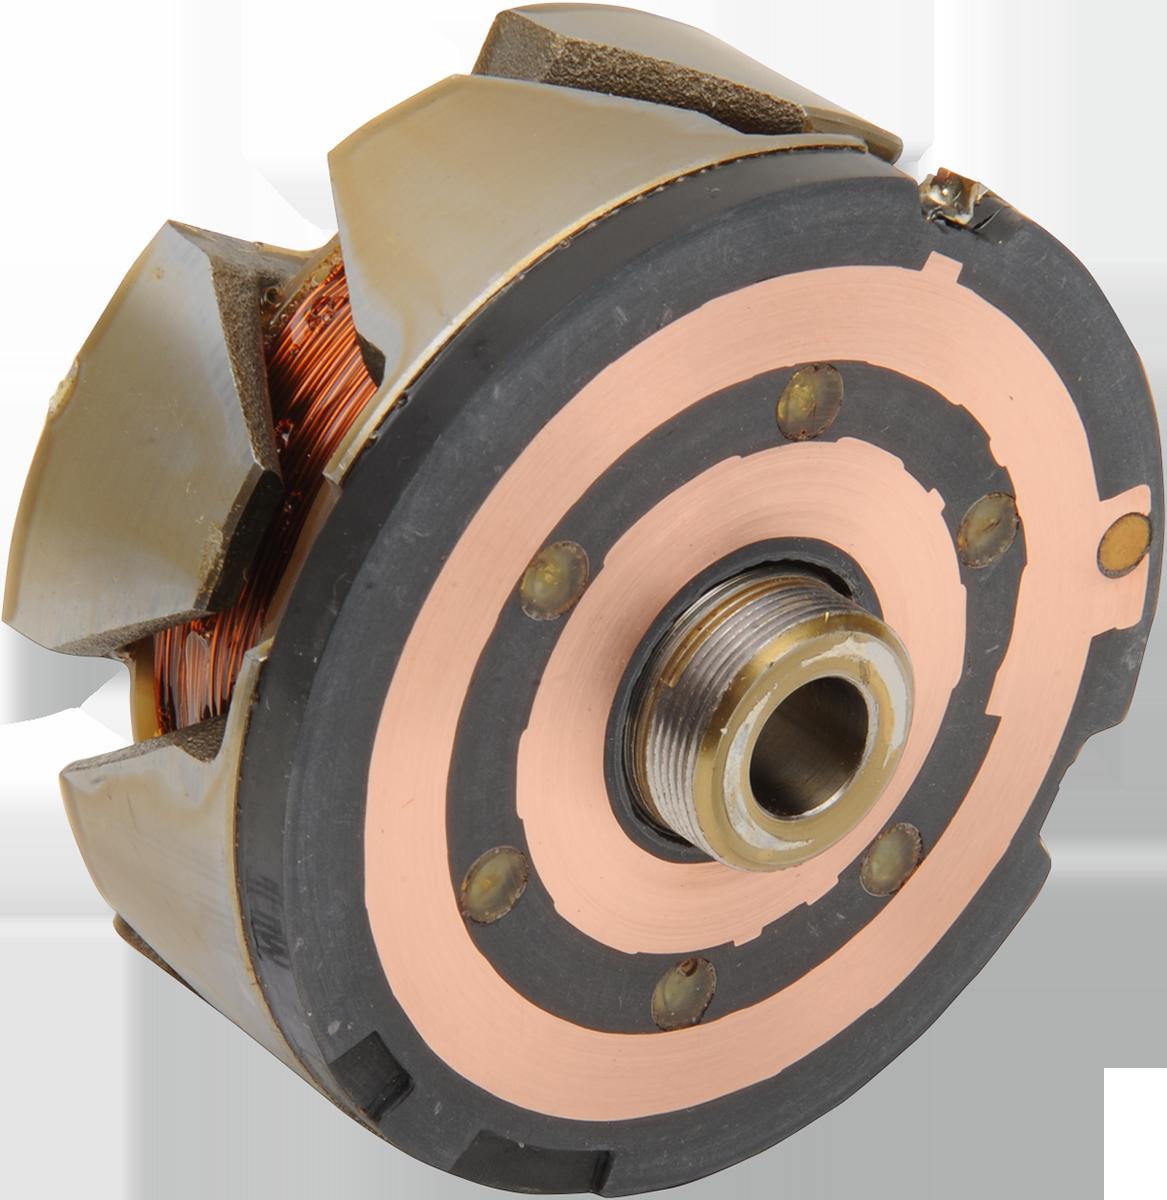 Ricks Electric OEM Replacement Alternator Rotor for 75-83 Yamaha XS650